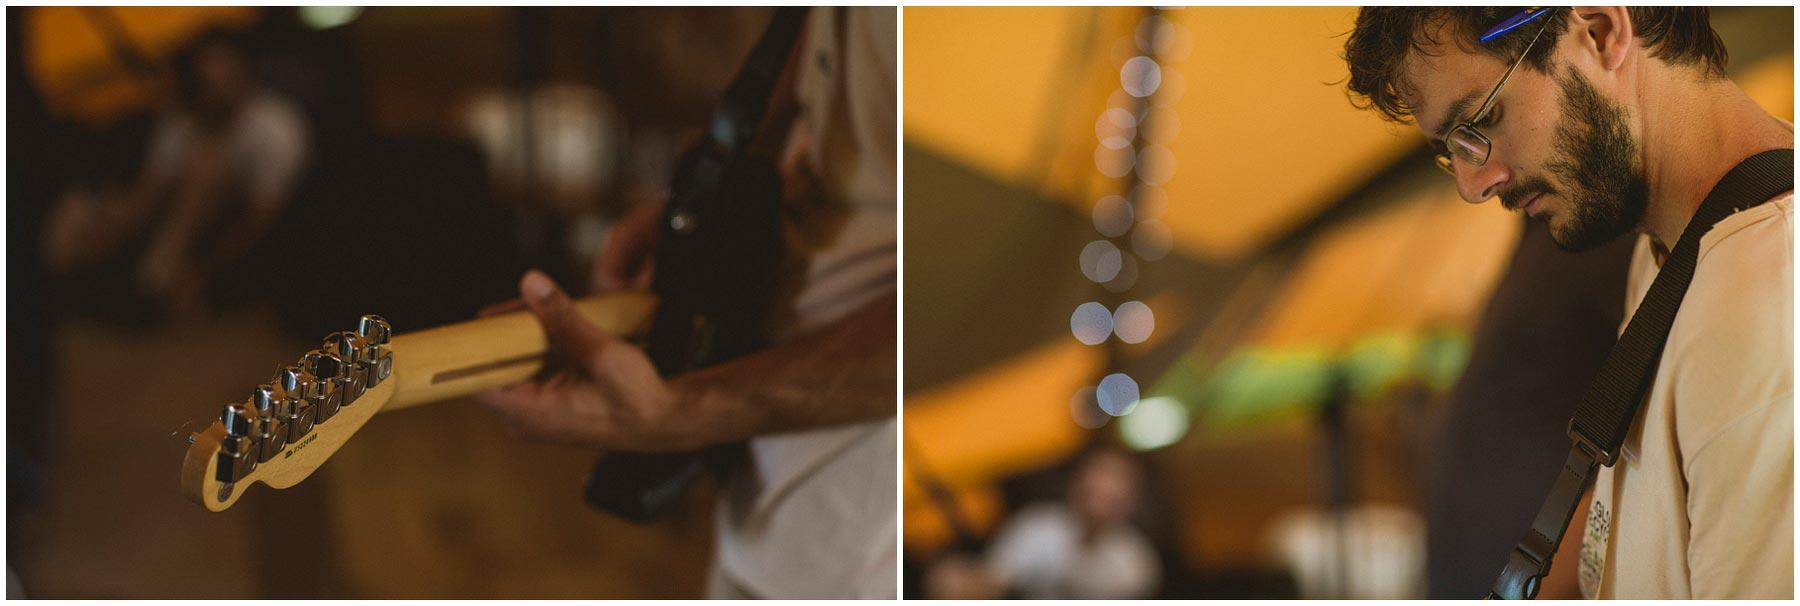 Kent-Festival-Tipi-wedding-photography_0011